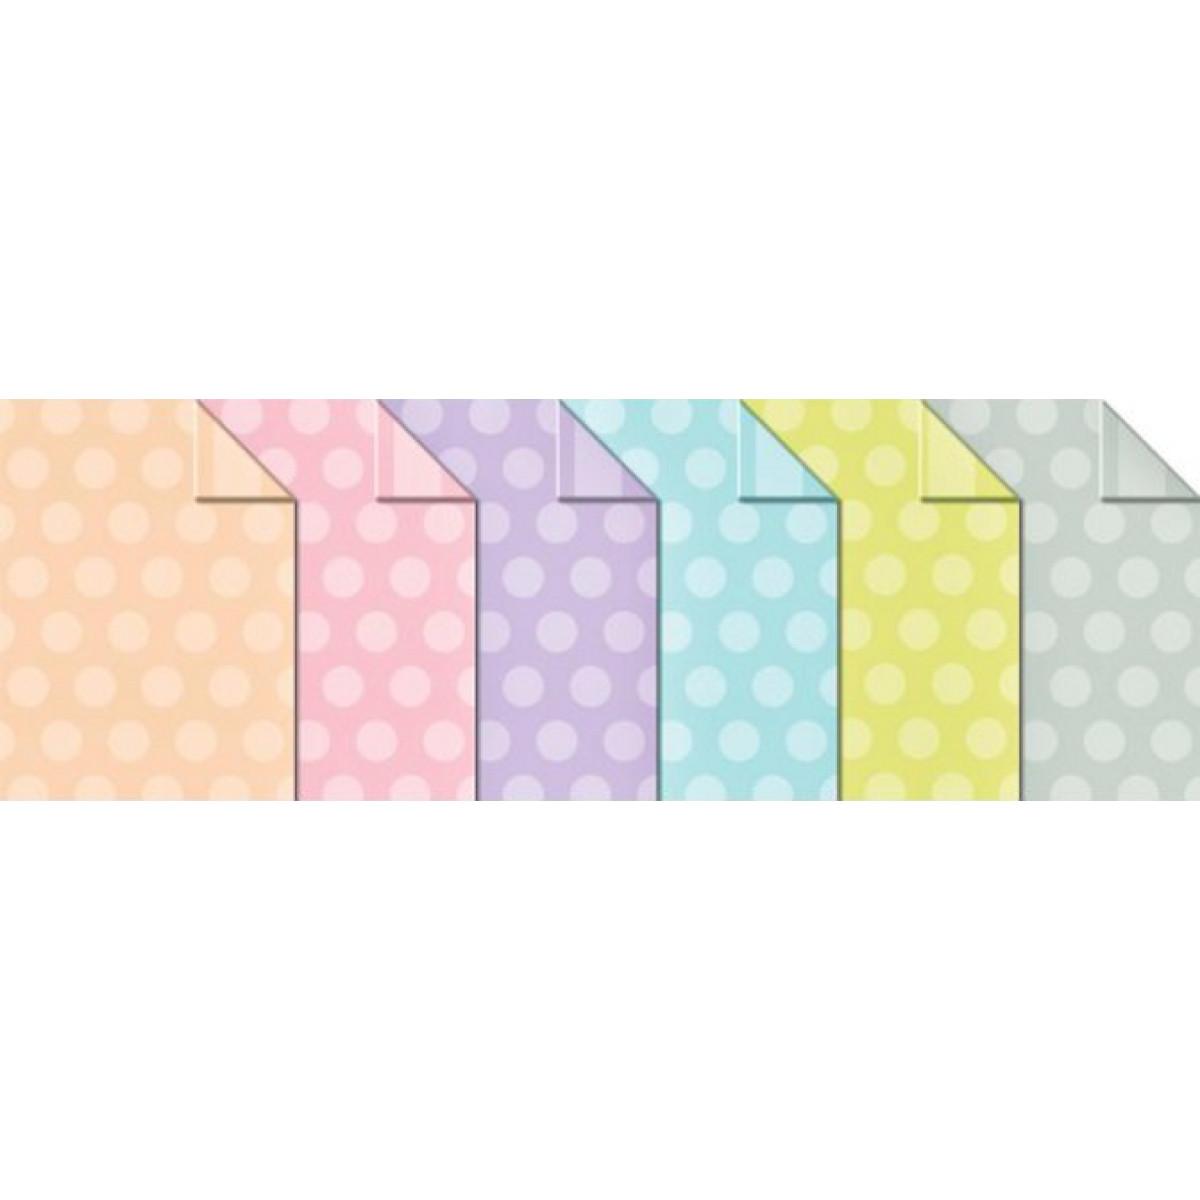 "2 Bögen 300 g//qm Blau Tonkarton /""Polka Dots /& Stripes /"" doppelseitig bedruckt"